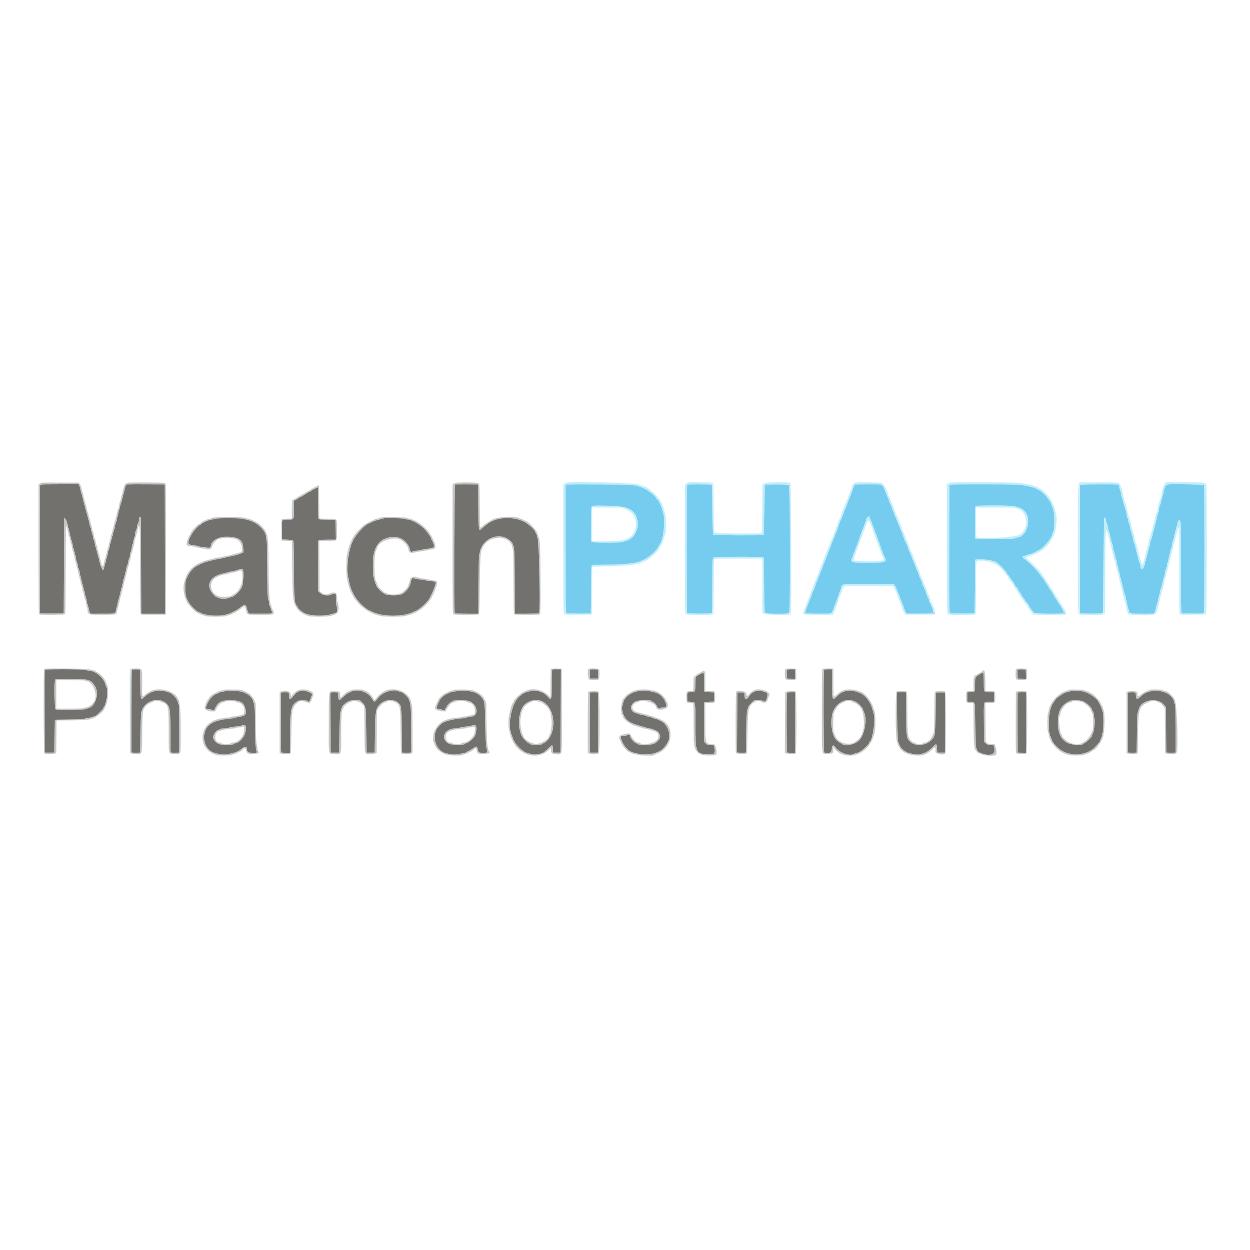 Bild zu MatchPHARM GmbH in Oberhaching